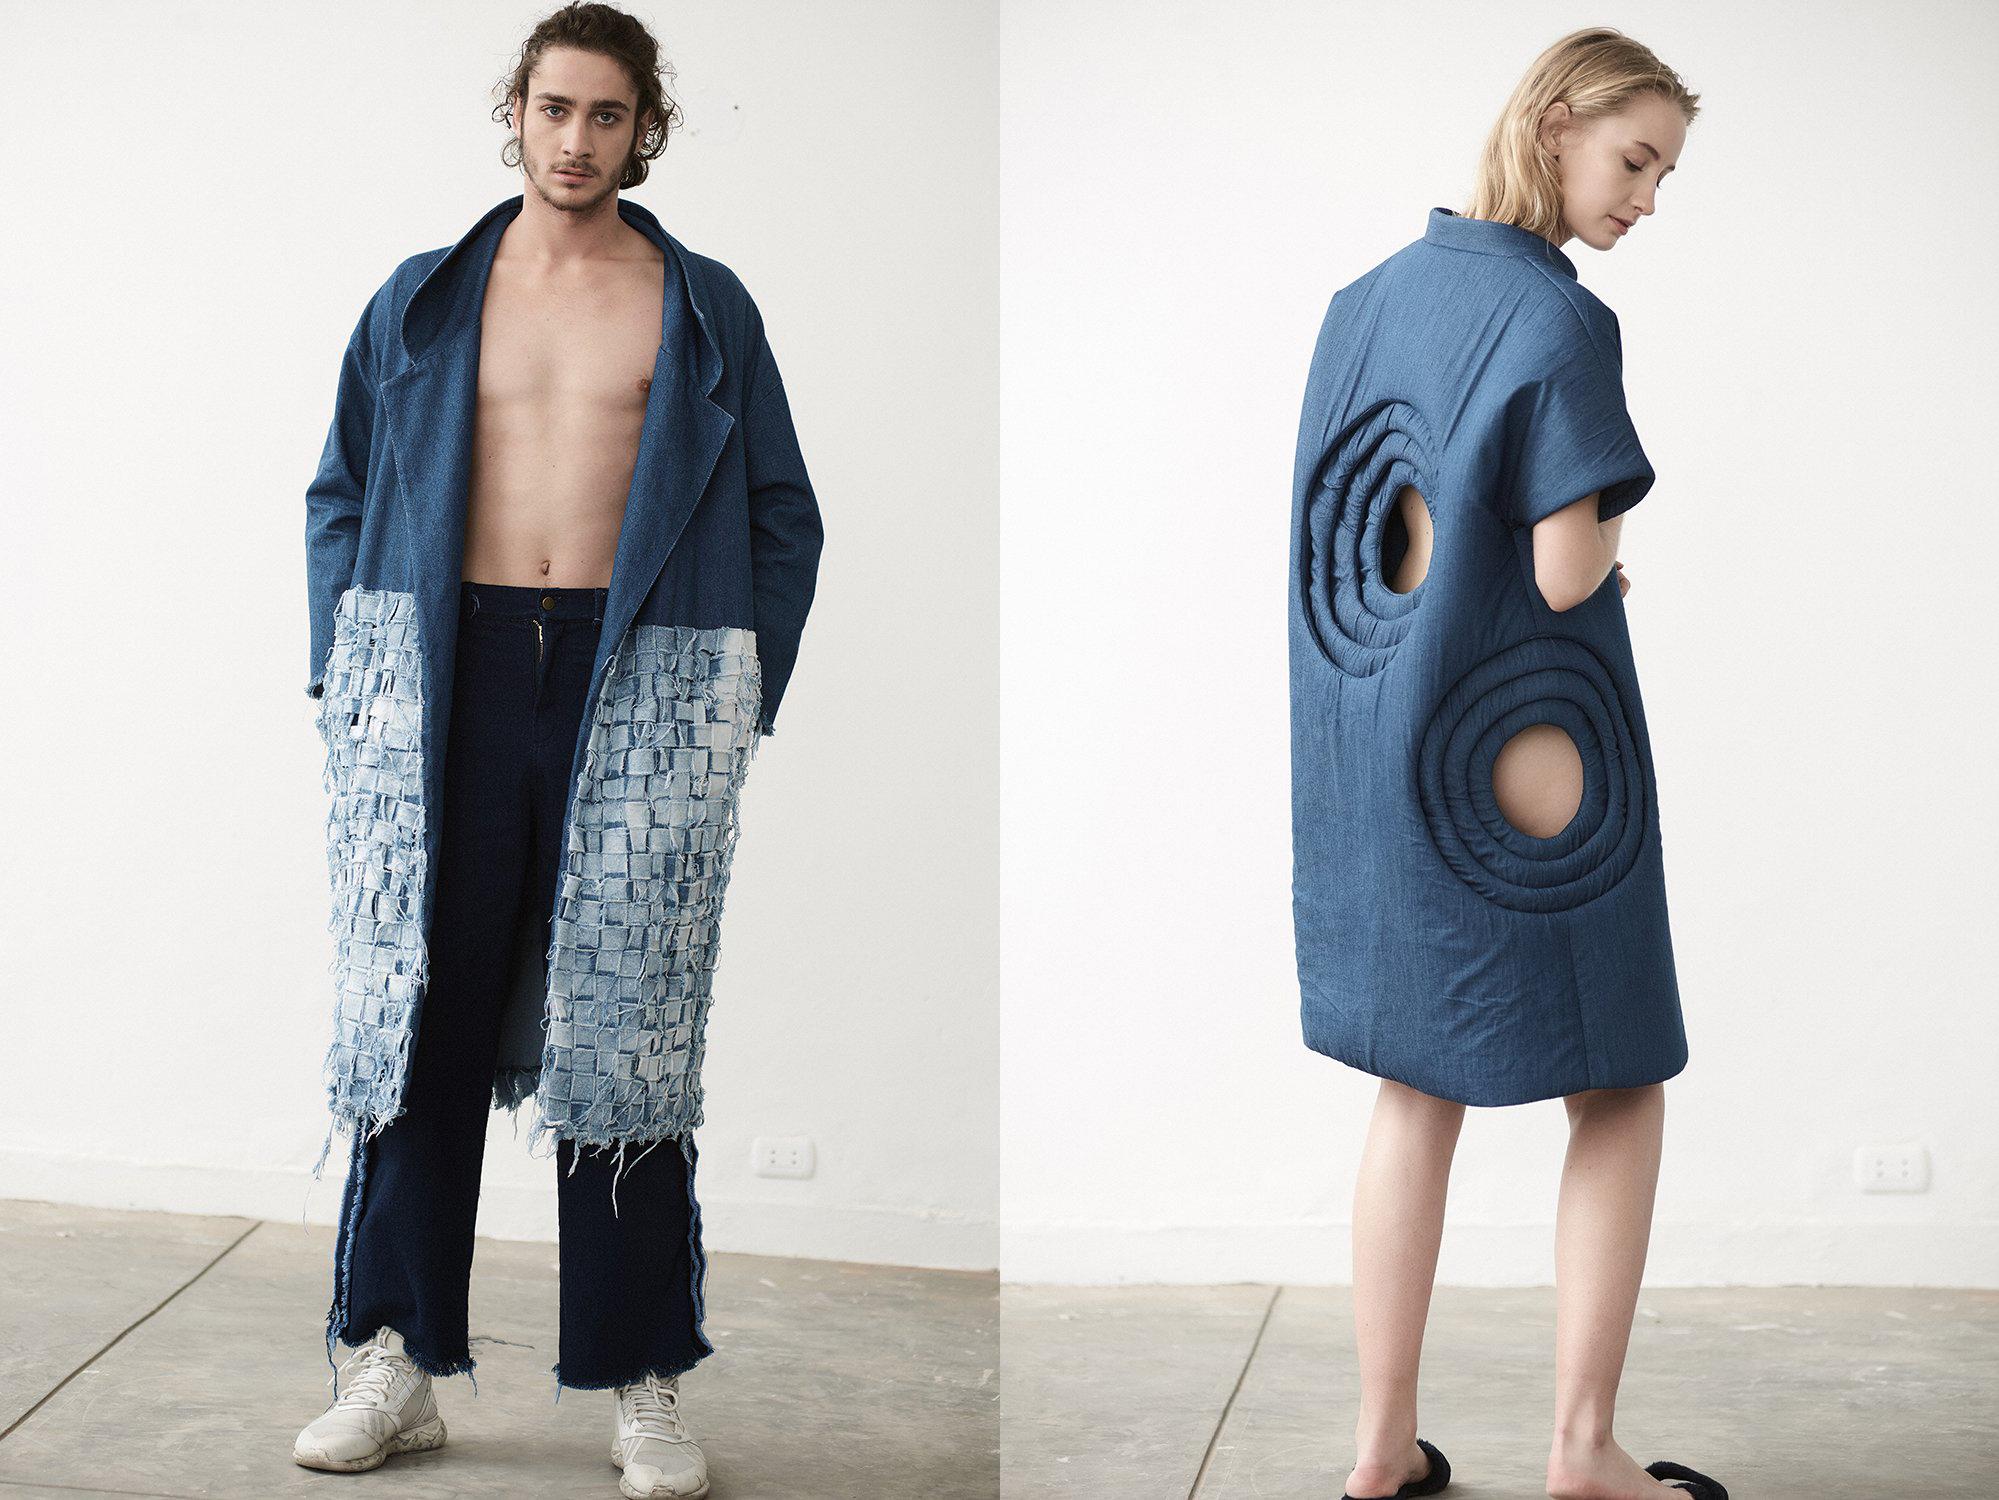 b8c8c578a5b Sophia Lerner is one of the designers defining Peru fashion right now.